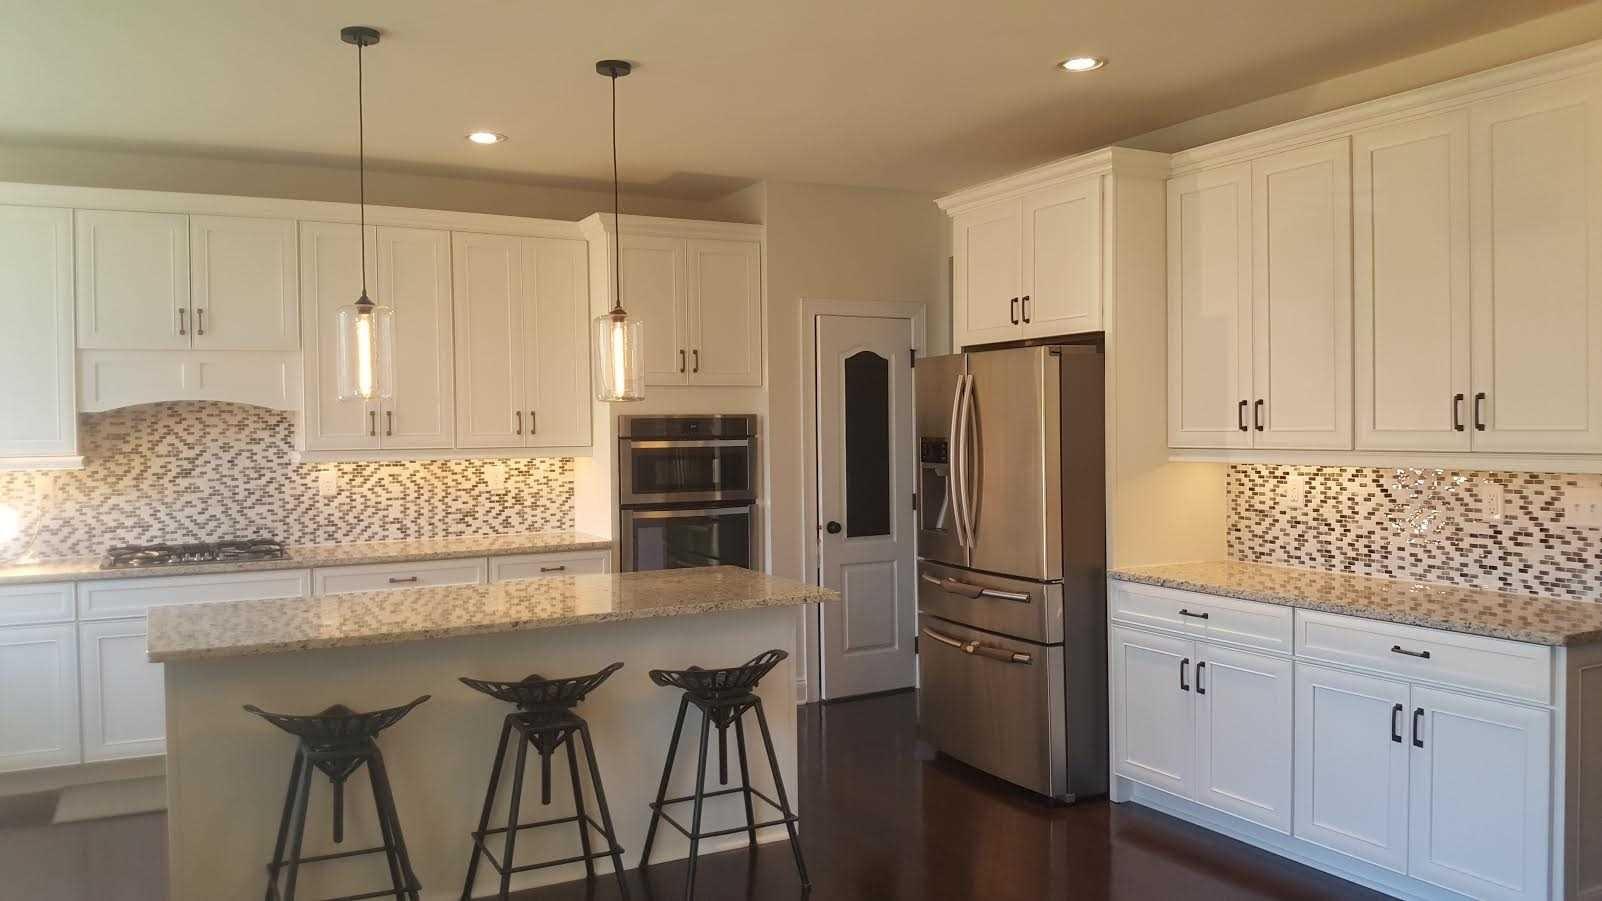 Additional photo for property listing at 26 SASSAFRAS Circle 26 SASSAFRAS Circle East Fishkill, New York 12533 United States